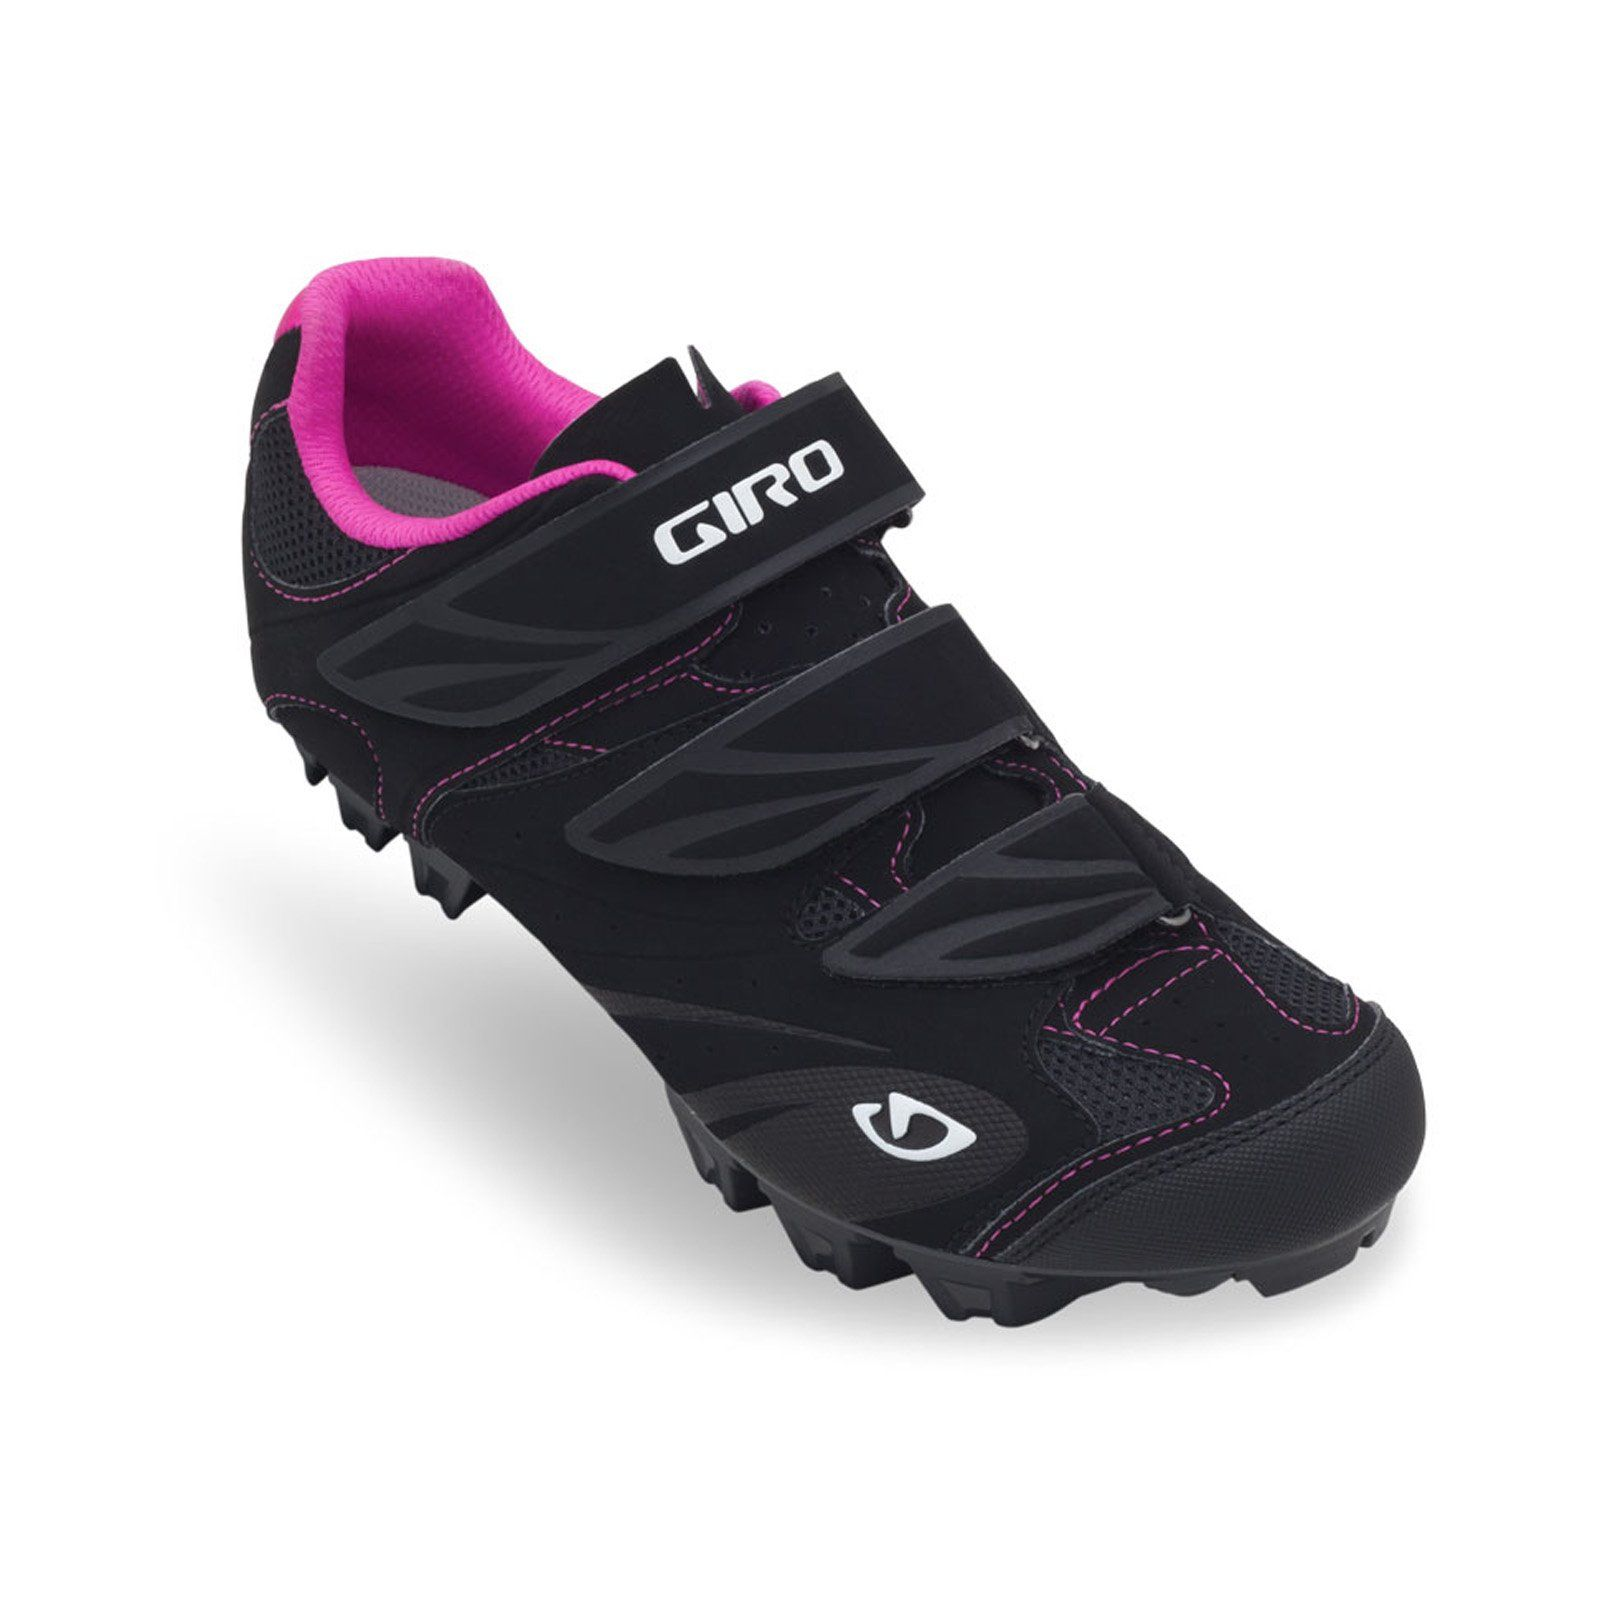 De Mujer Zapatillas Ciclismo 40Bicis Black Para Giro Red kuOXPiTZ